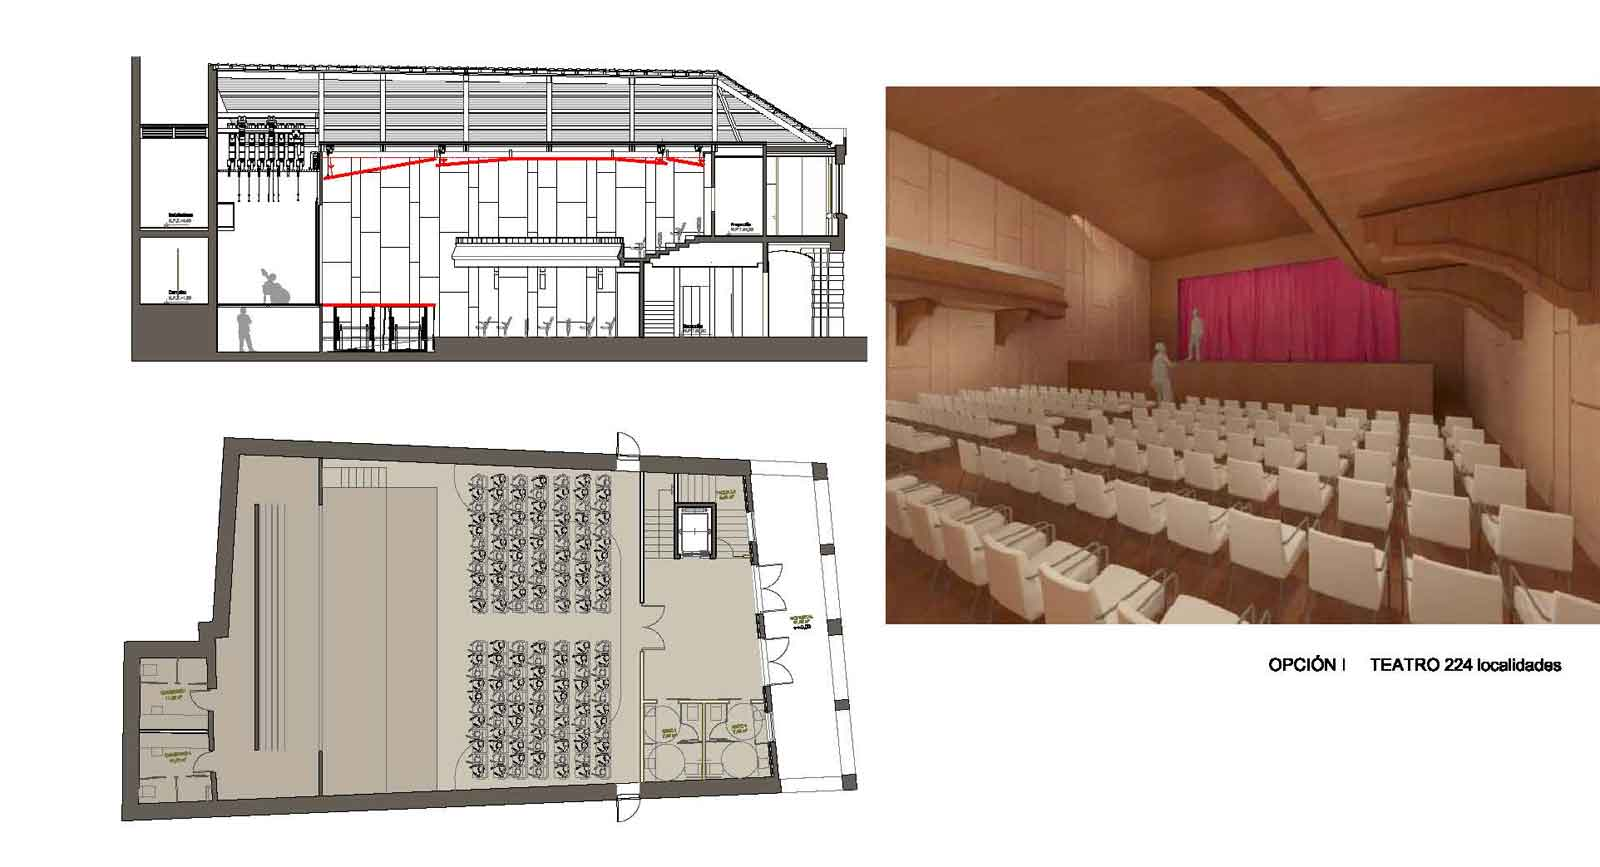 03-opcion-I-teatro